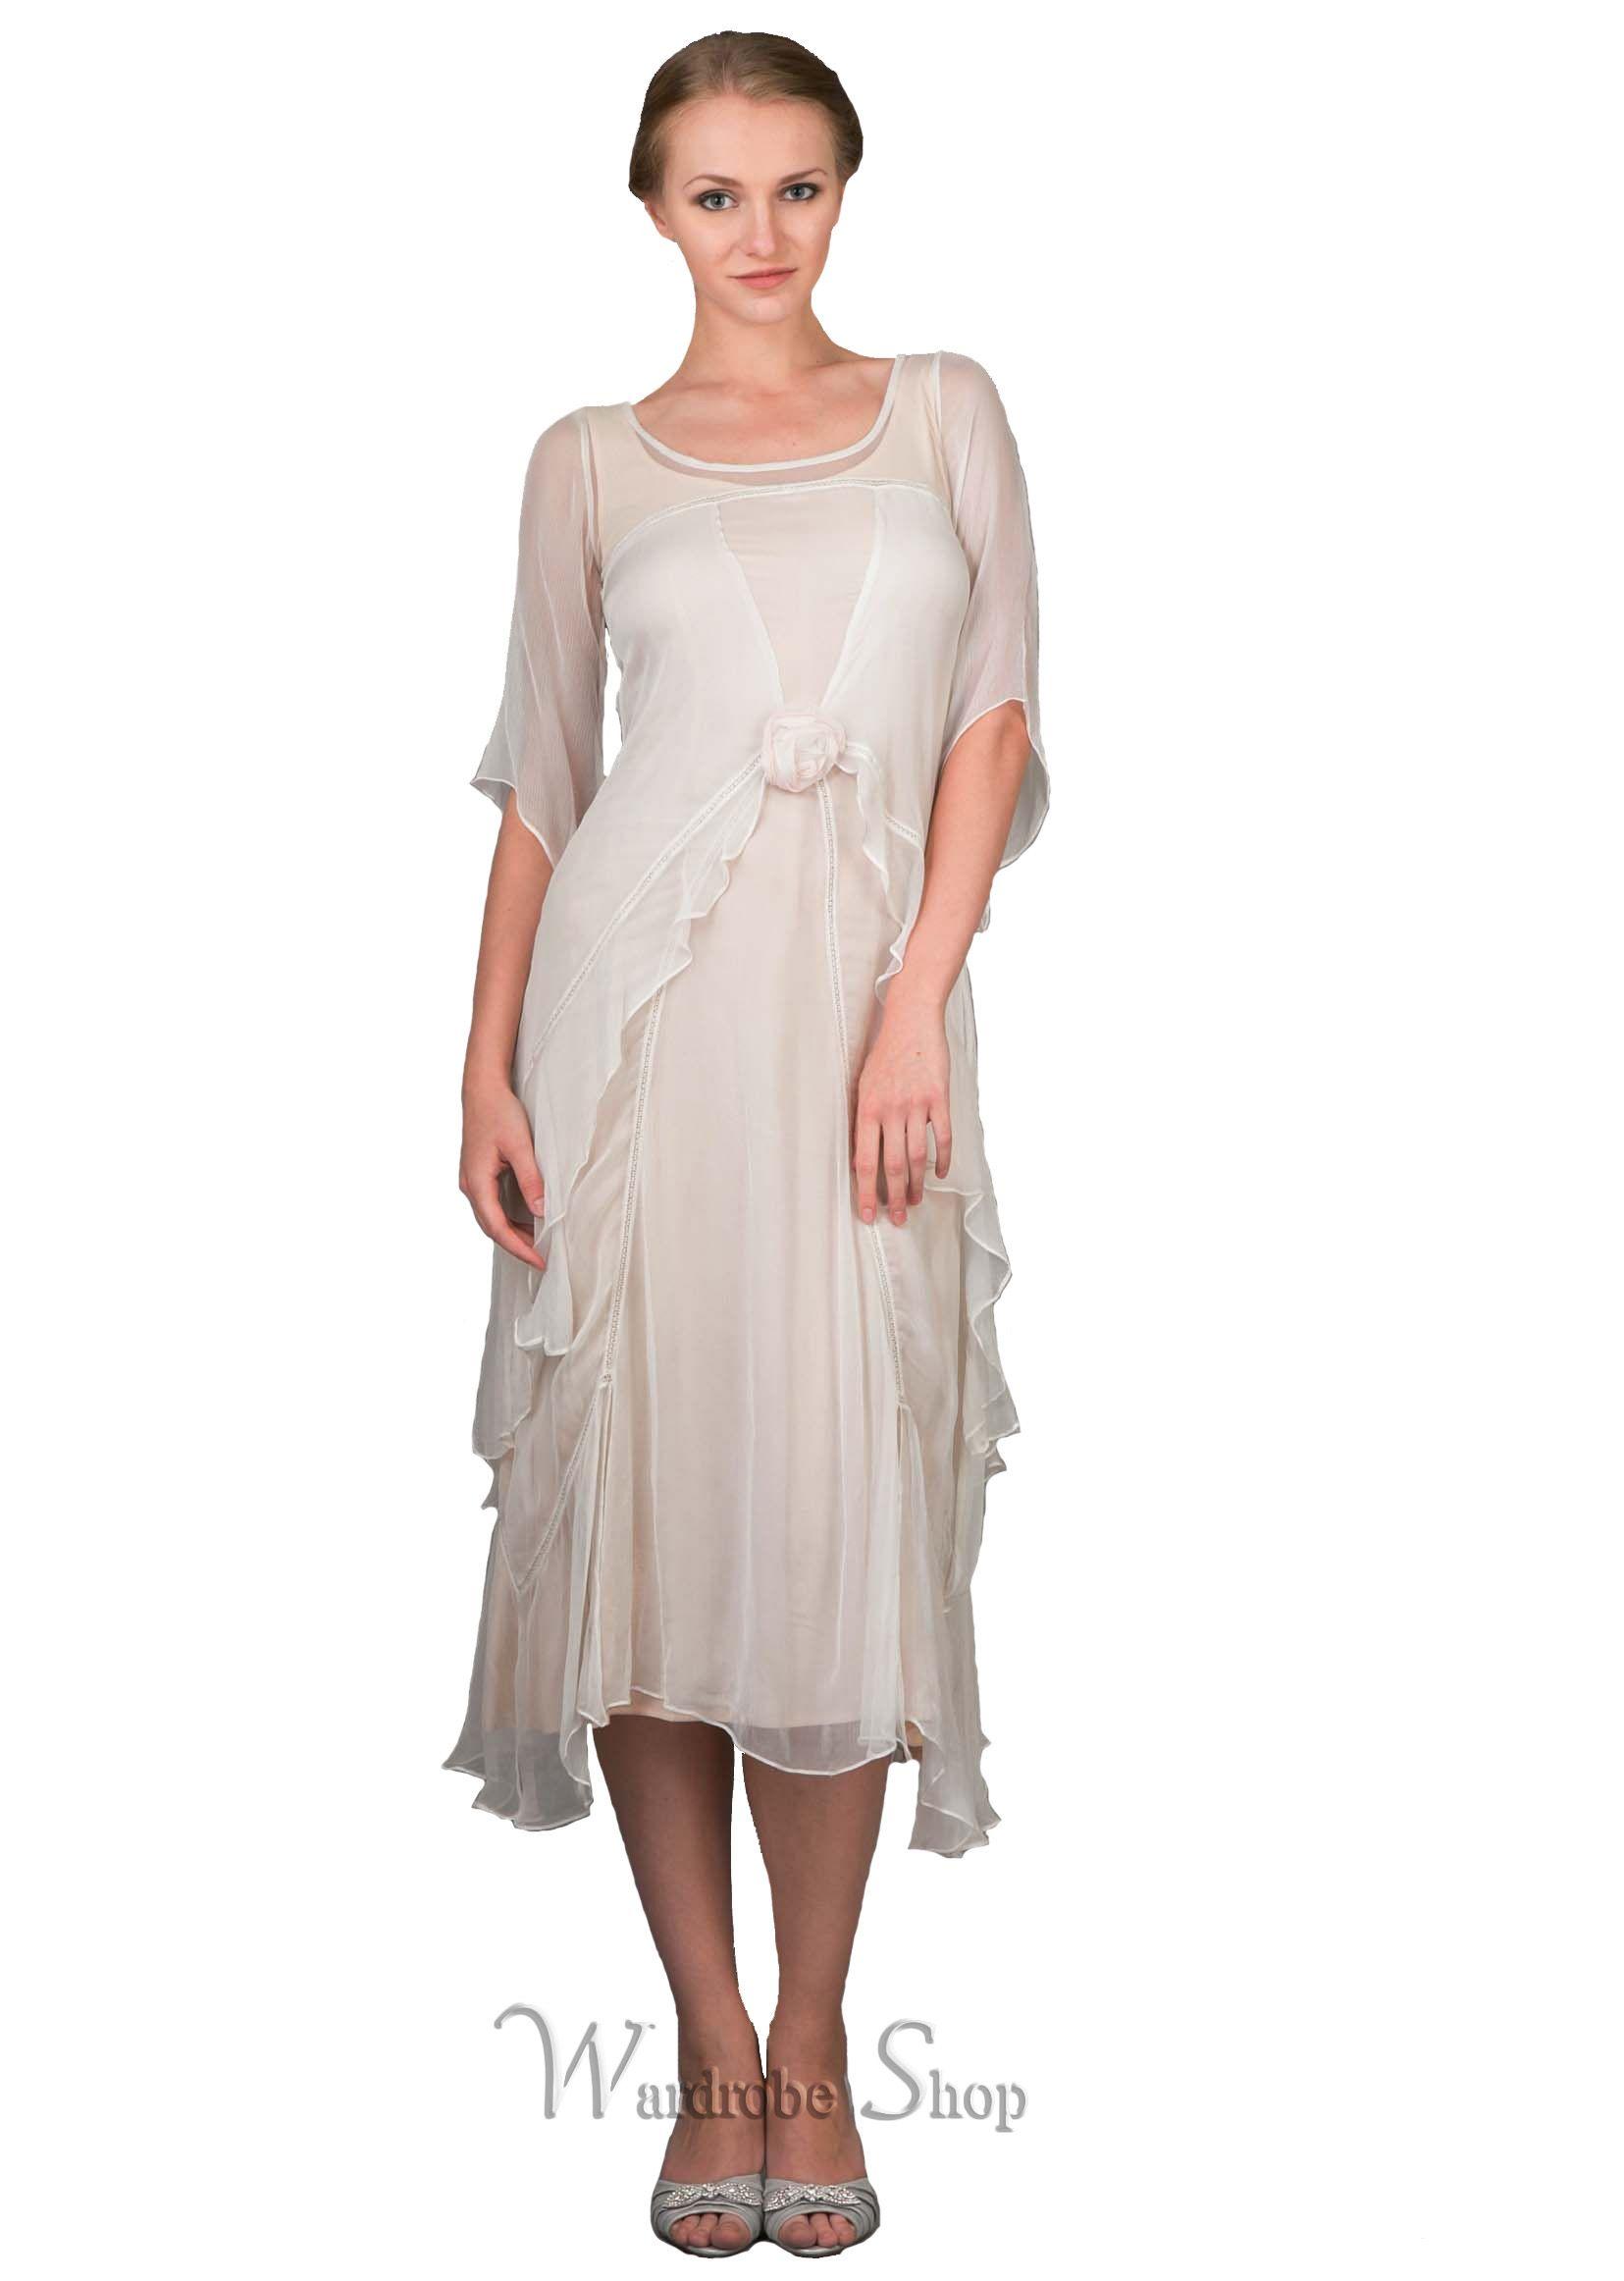 Romantic Vintage Style Wedding Dresses Mother Of The Bride Or Groom Dresses Vintage Style Wedding Dresses Great Gatsby Dresses Alternative Wedding Dresses [ 2324 x 1655 Pixel ]